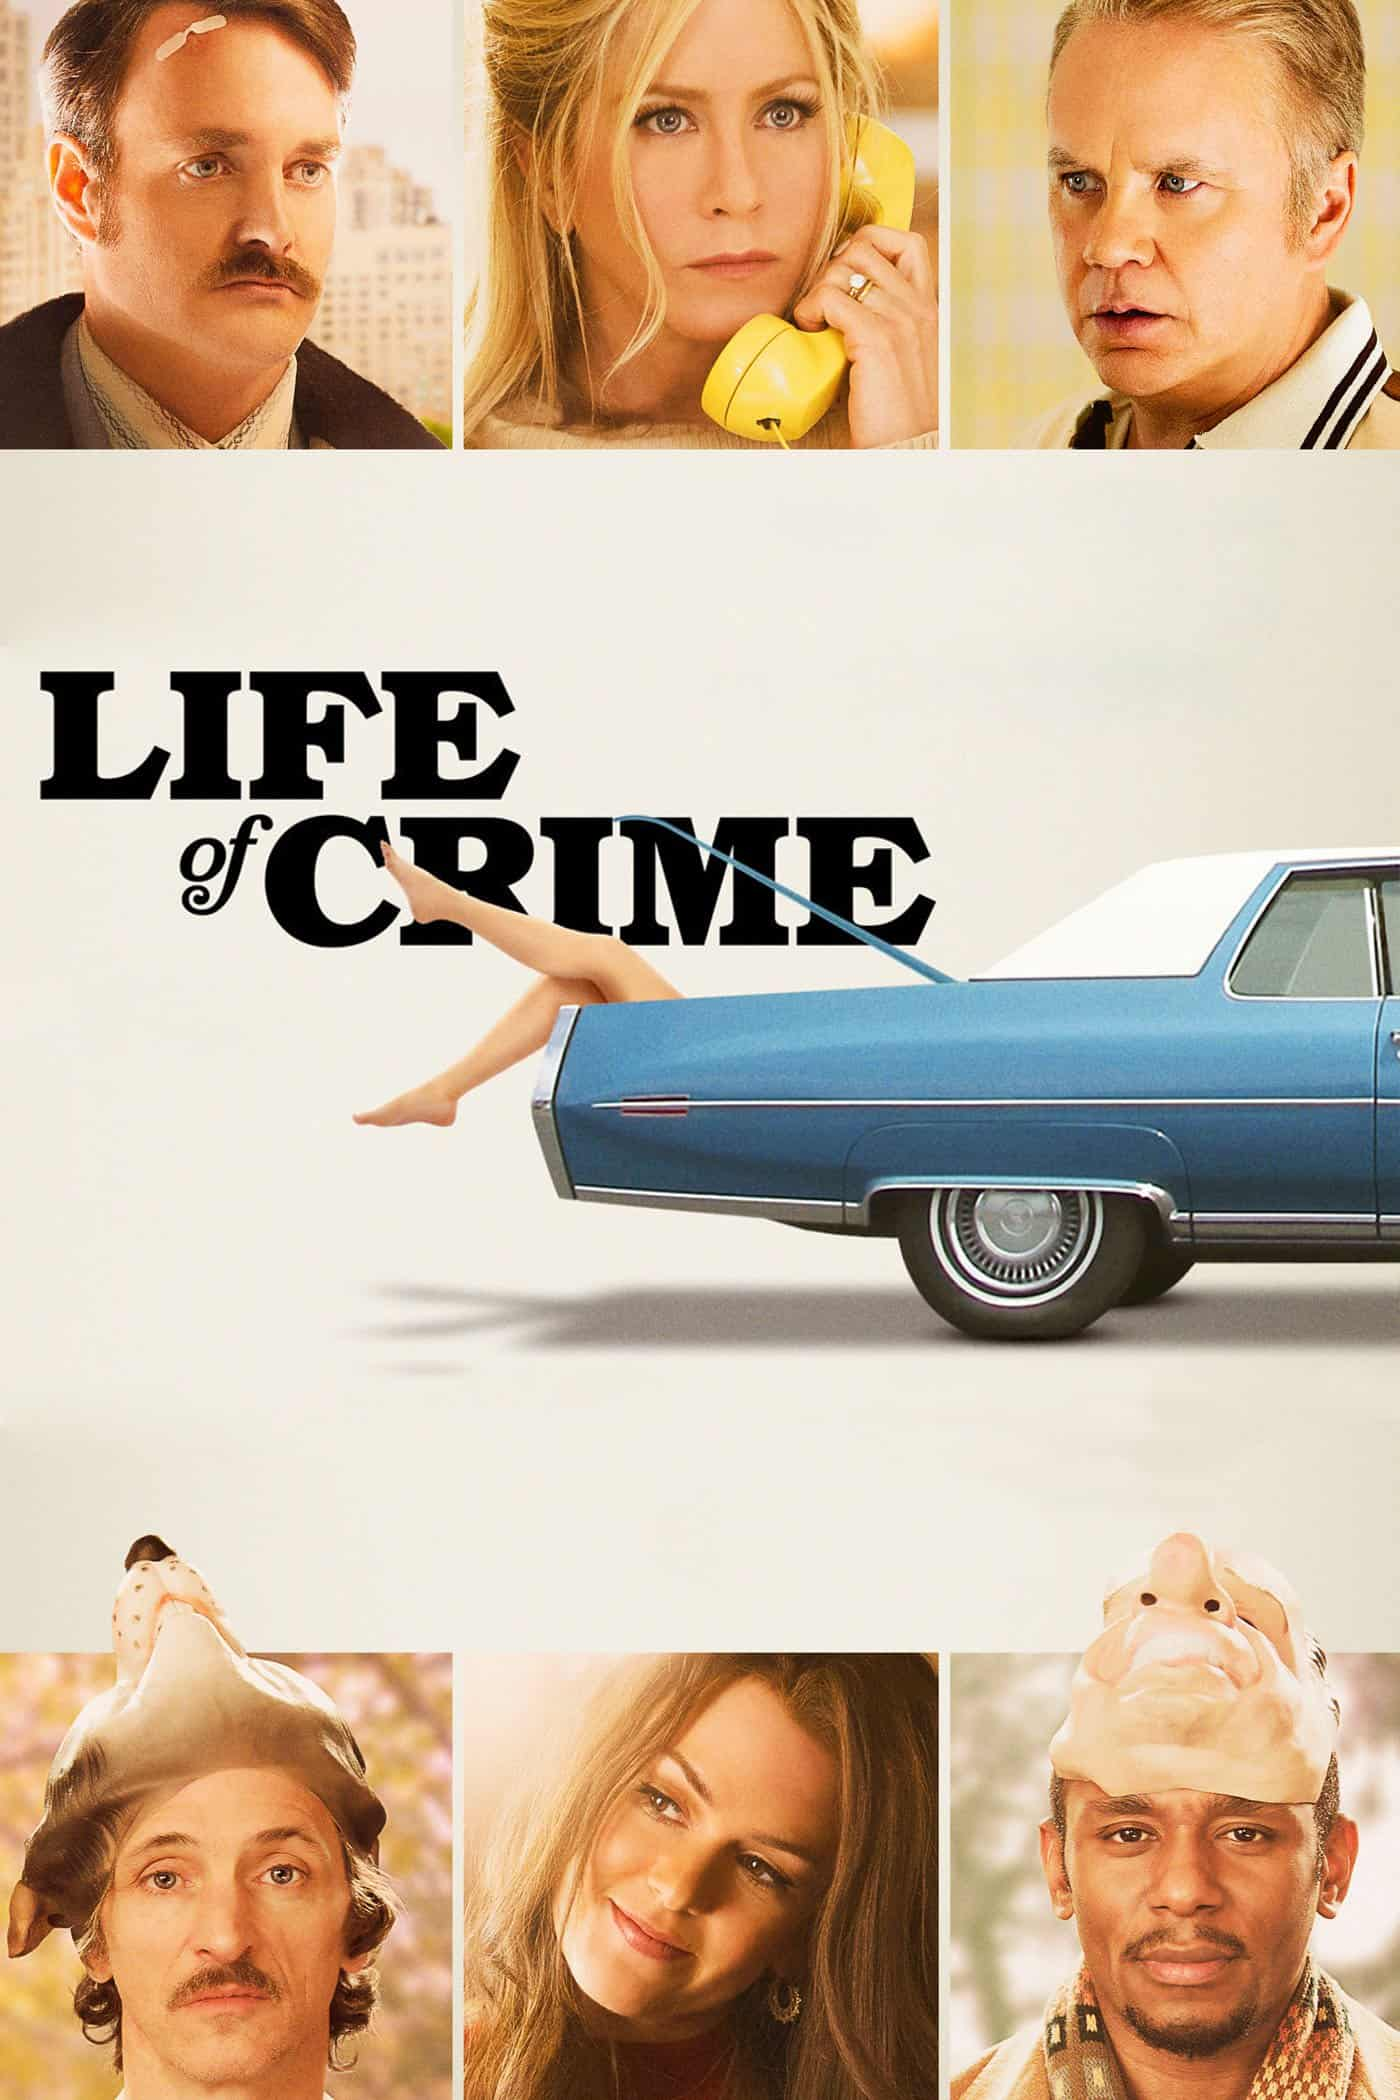 Life of Crime, 2013